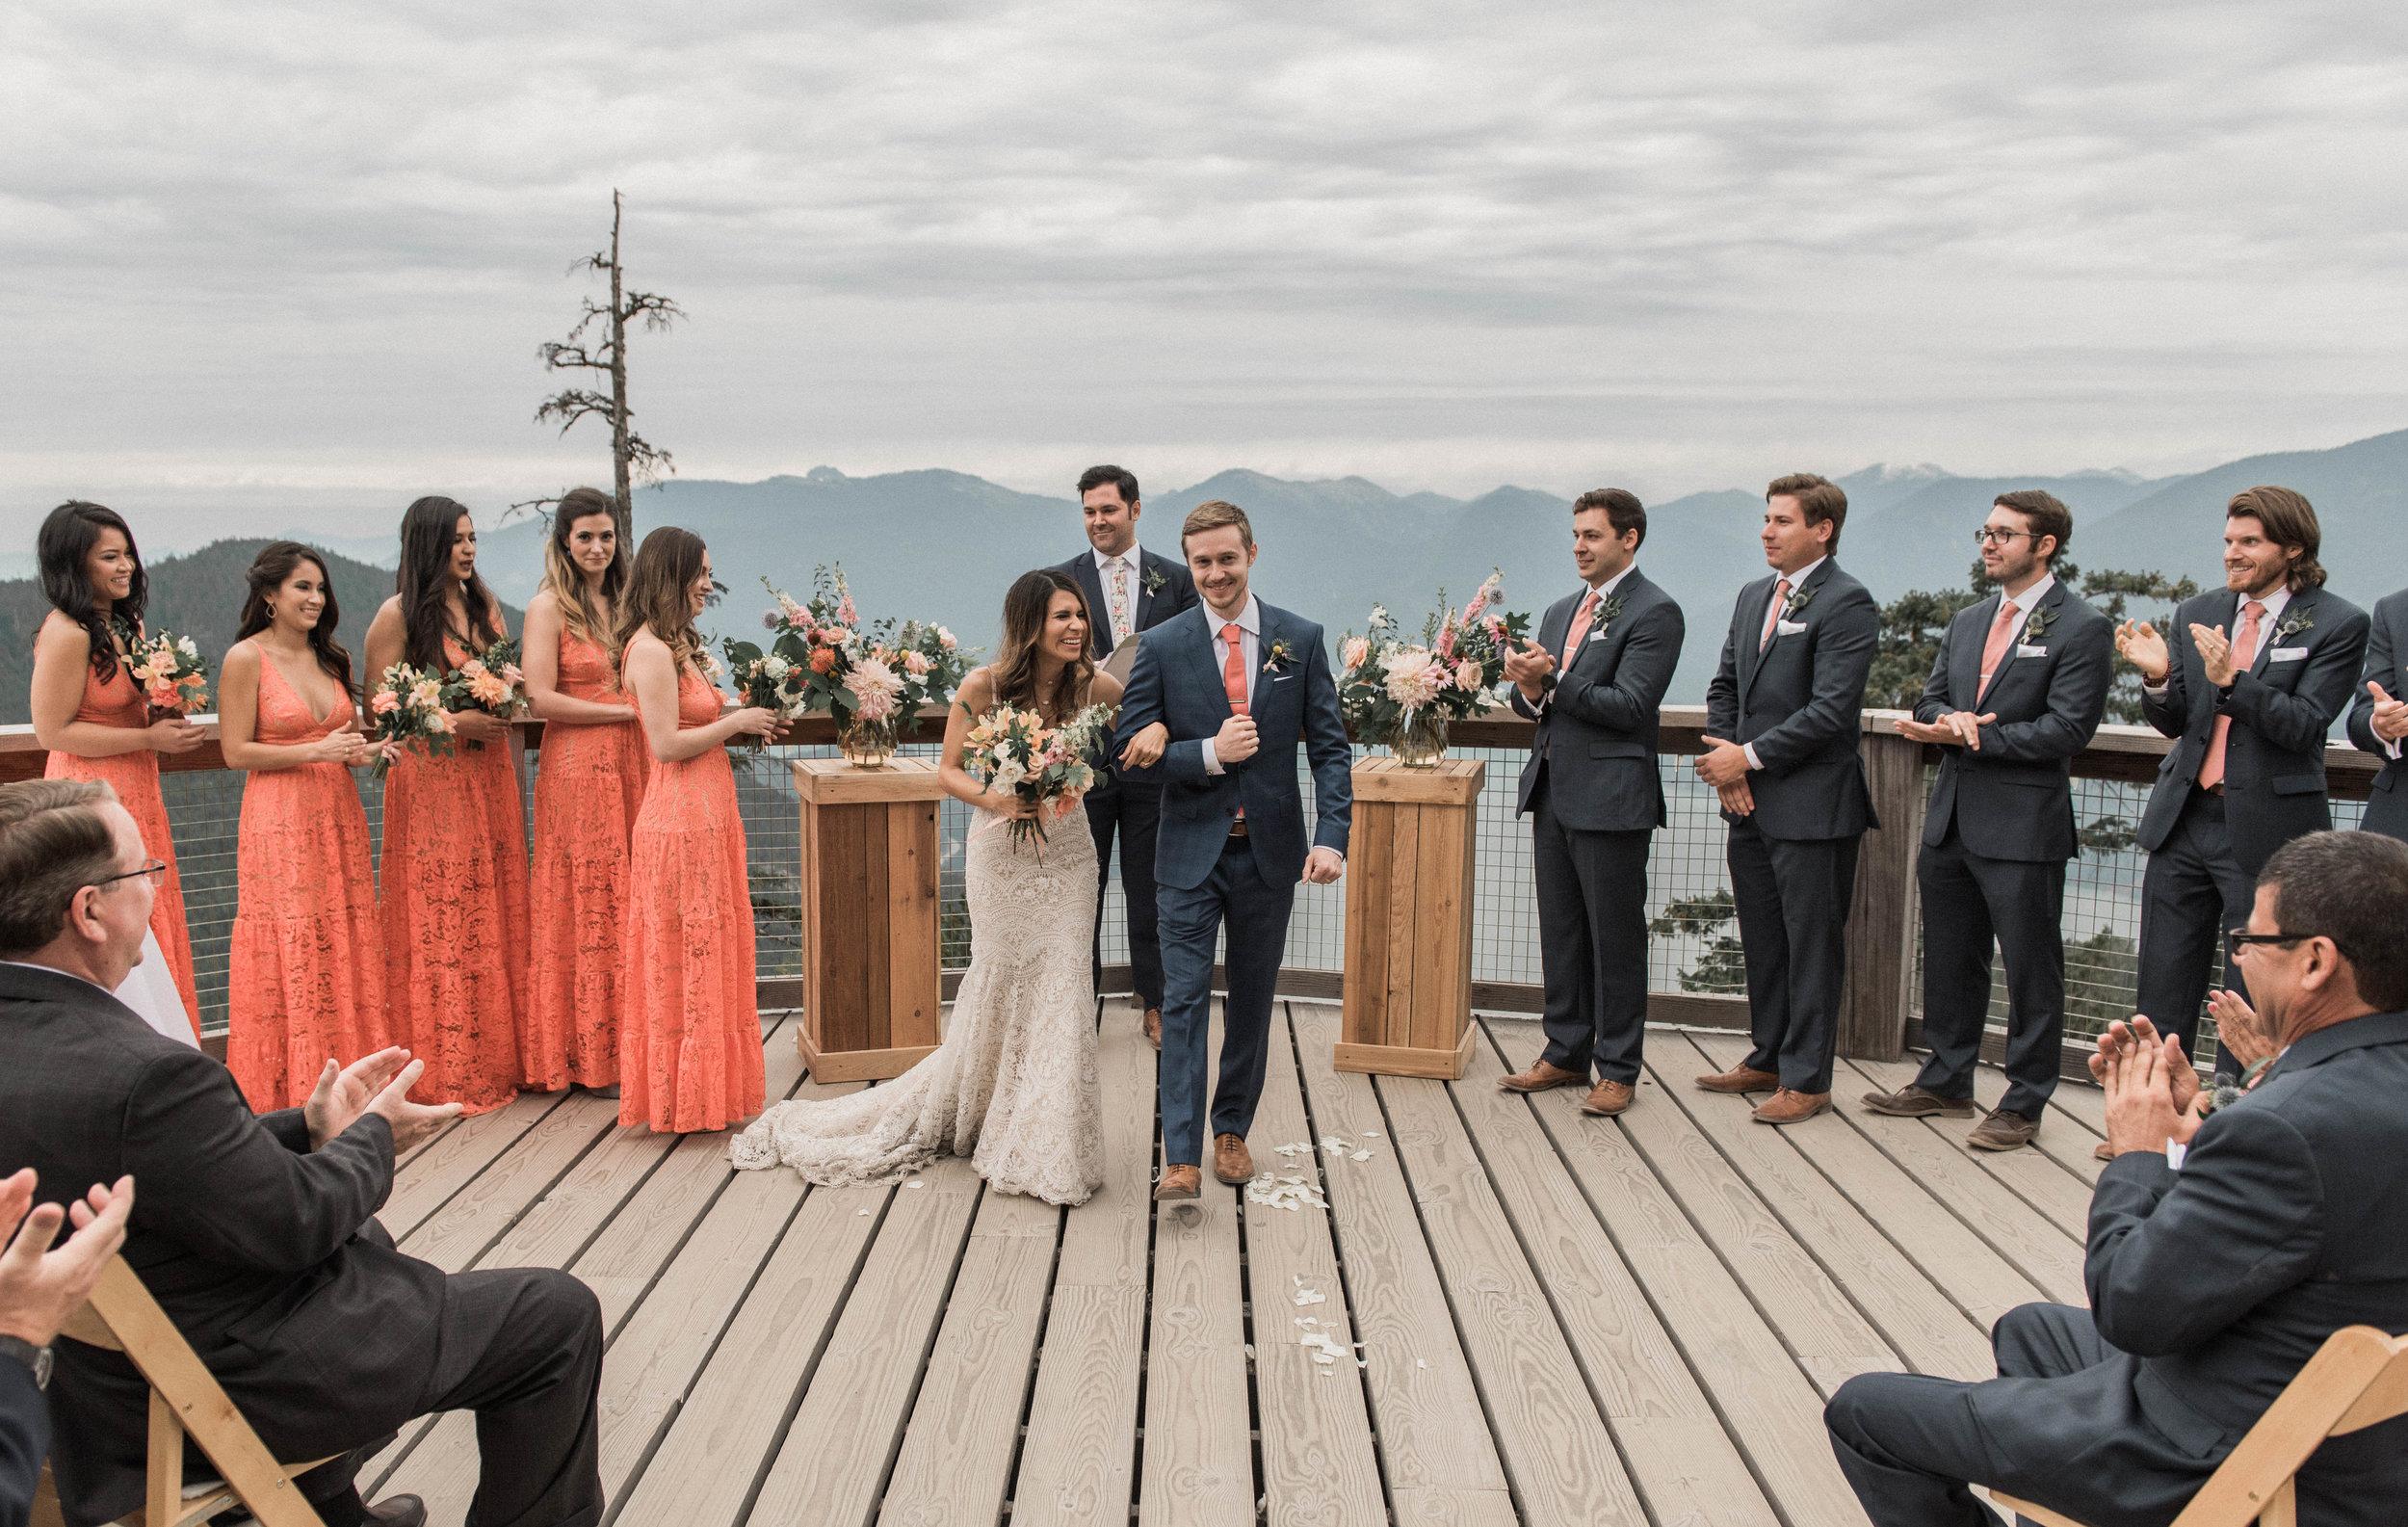 austin-texas-wedding-photography-1778-photographie-96.jpg